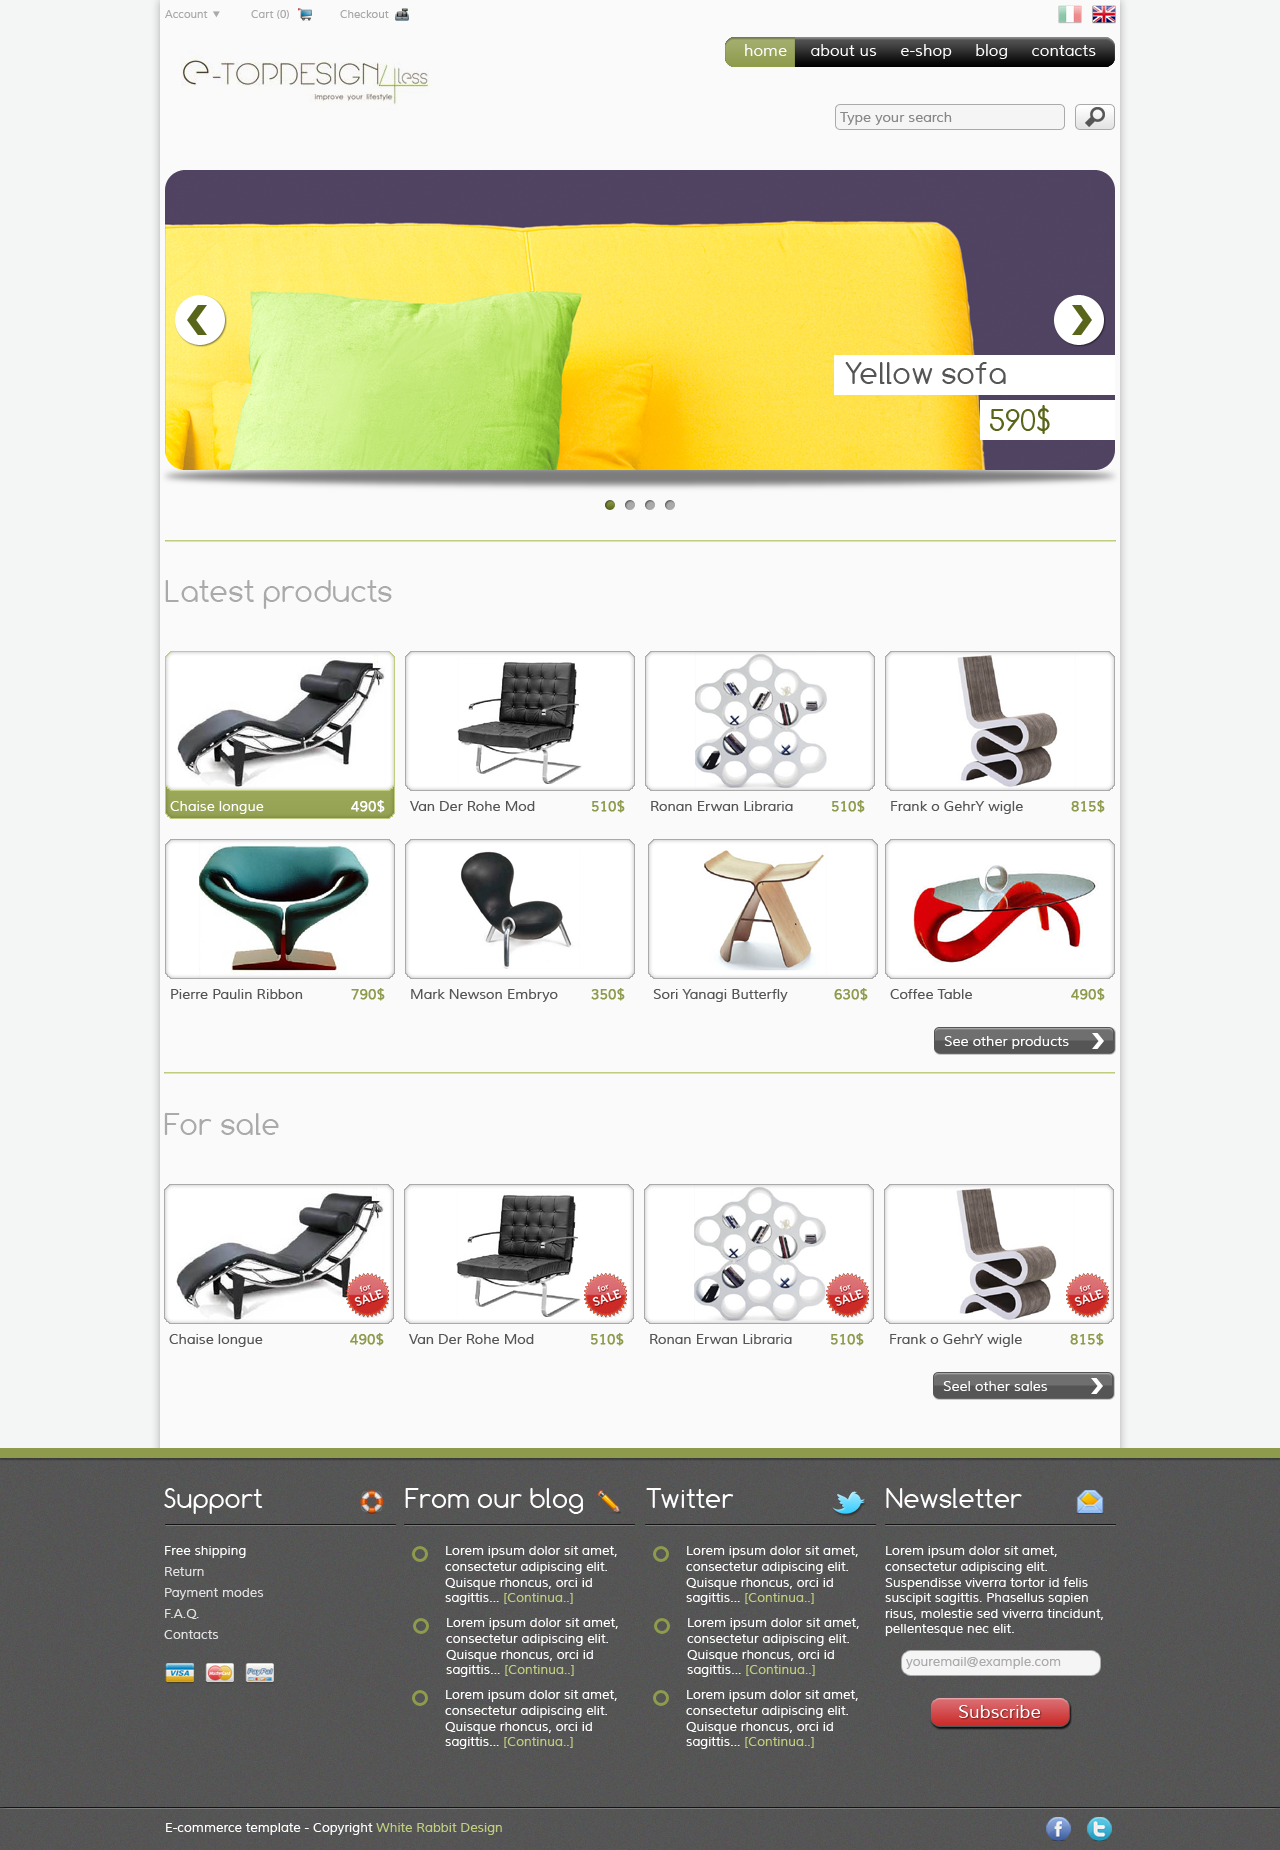 E-commerce layout by kekkorider on DeviantArt